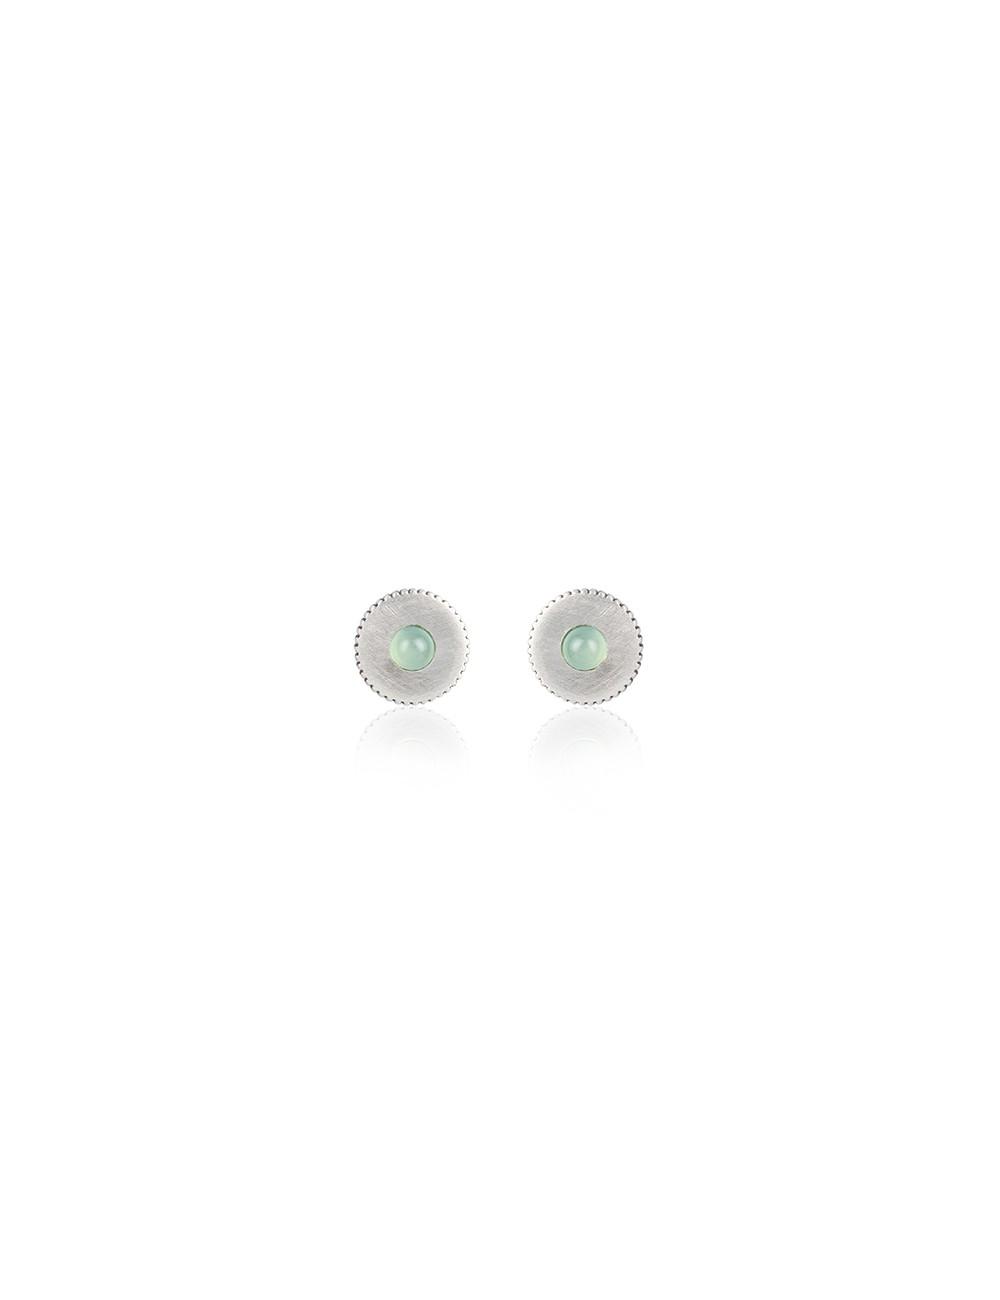 Sunfield -Pendientes Sunfield plata y calcedonia -PE062331/13